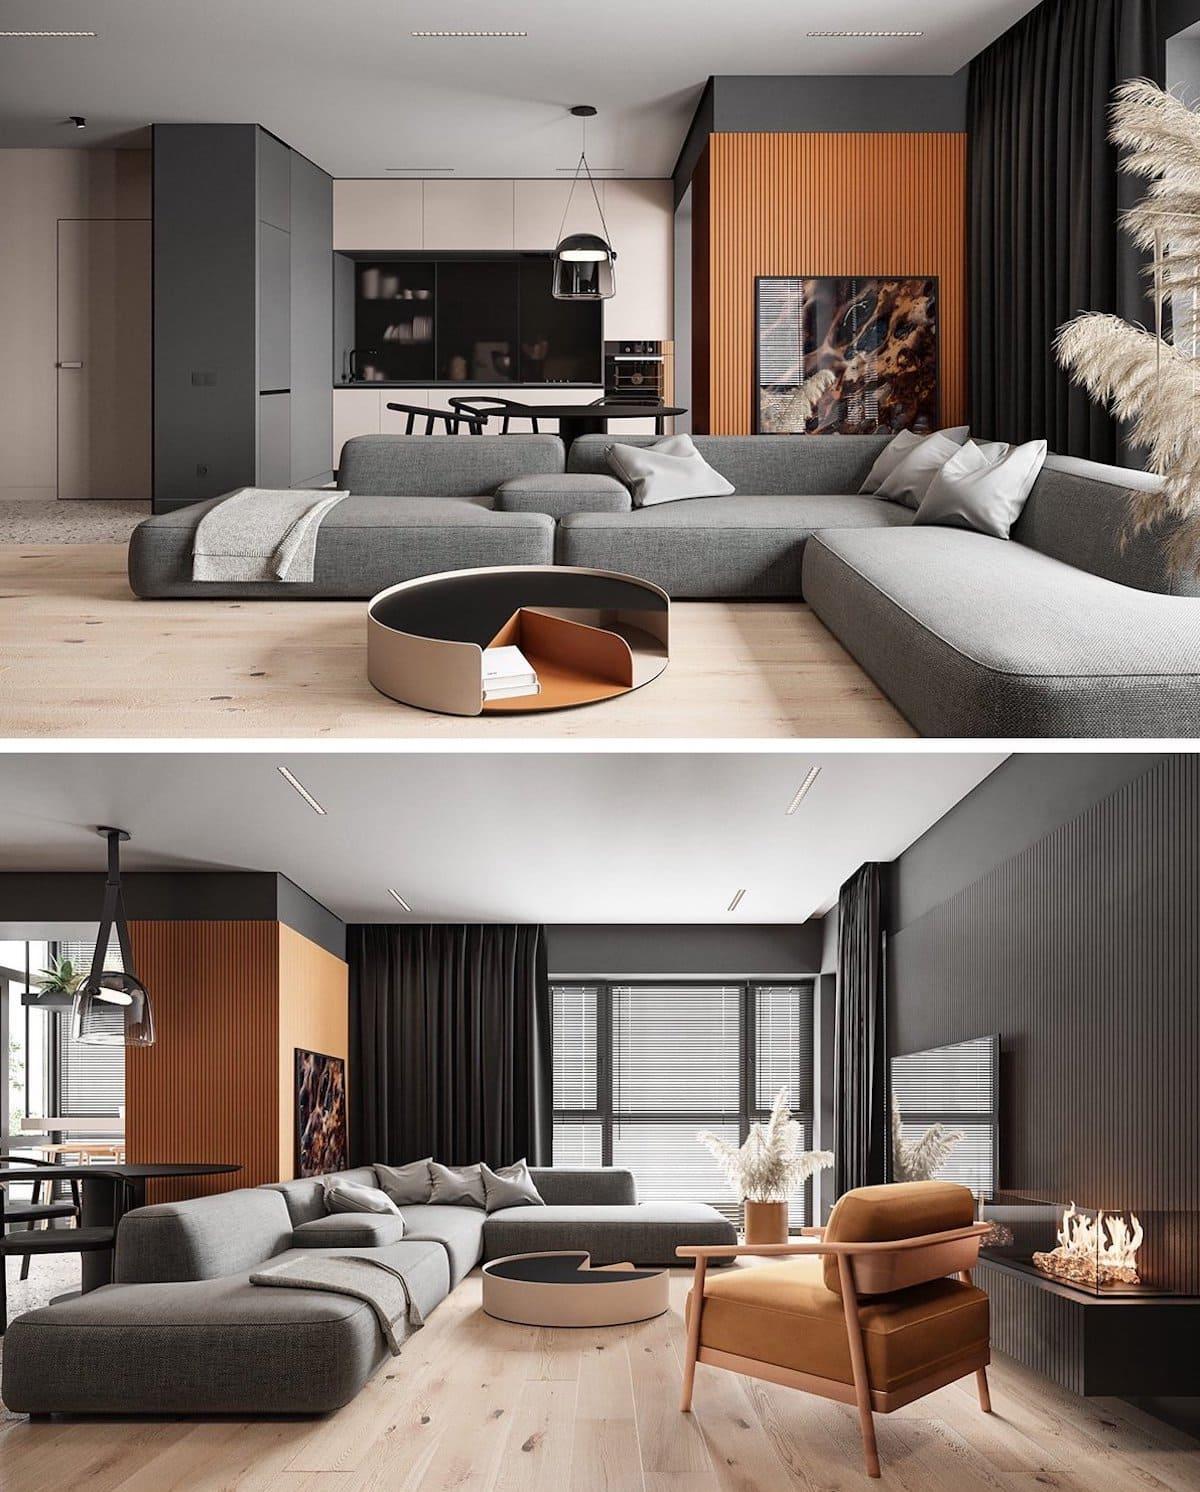 модный дизайн интерьера квартиры фото 74